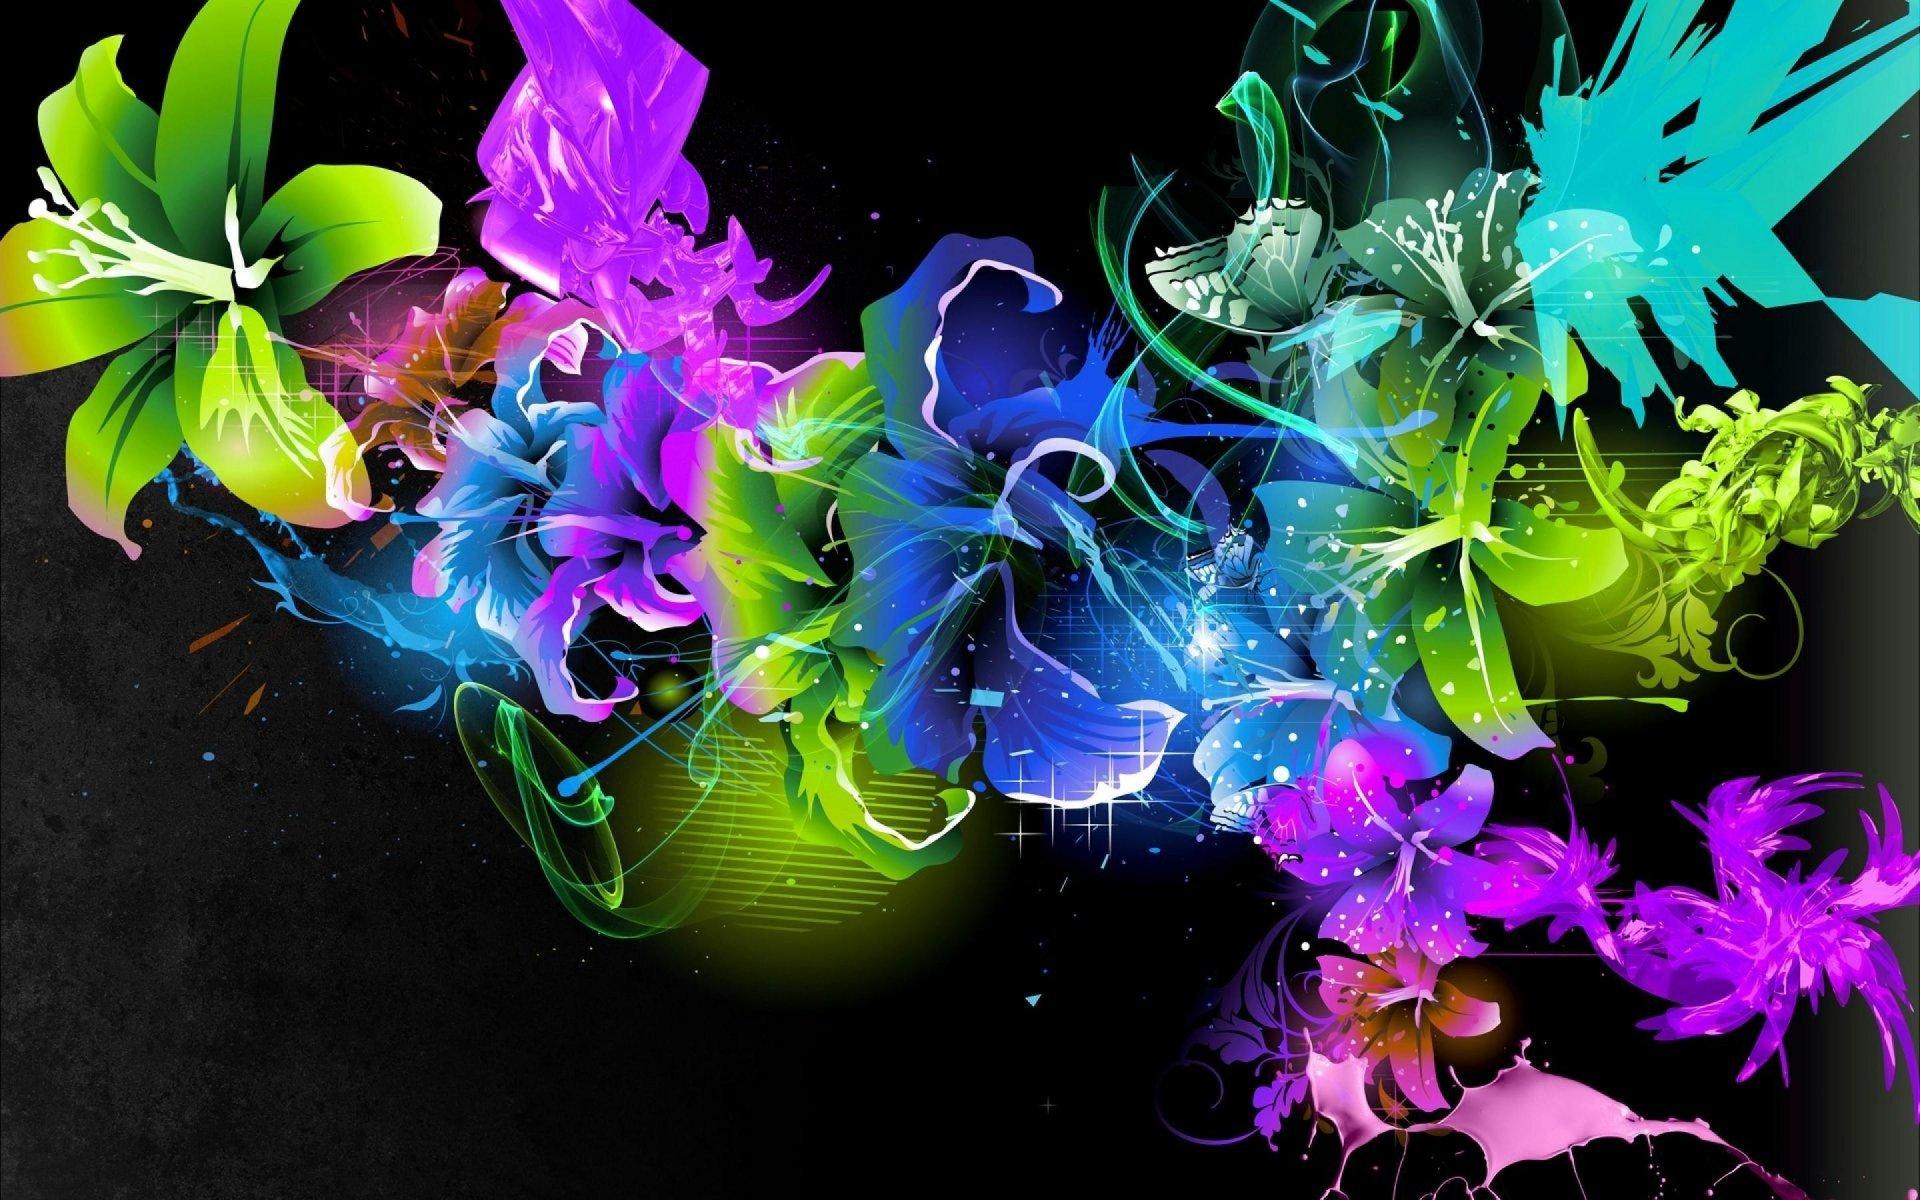 абстракция цветок частицы скачать